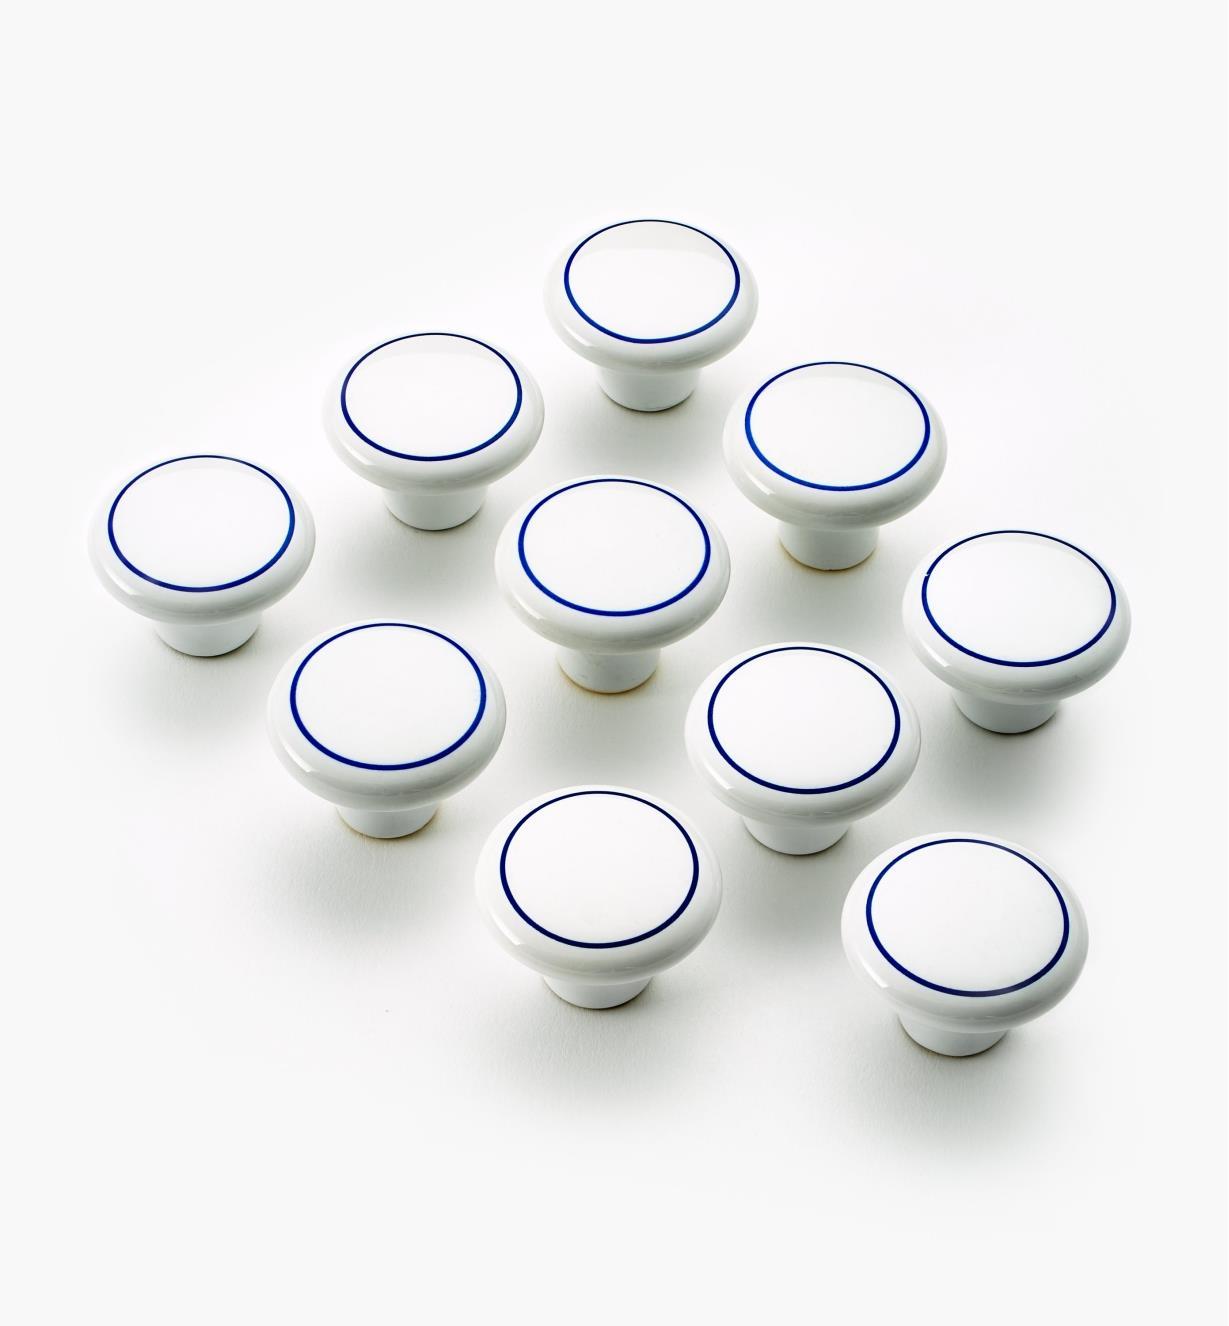 03W1630 - Boutons en céramique, anneau bleu, 11/2pox11/8po,lotde10